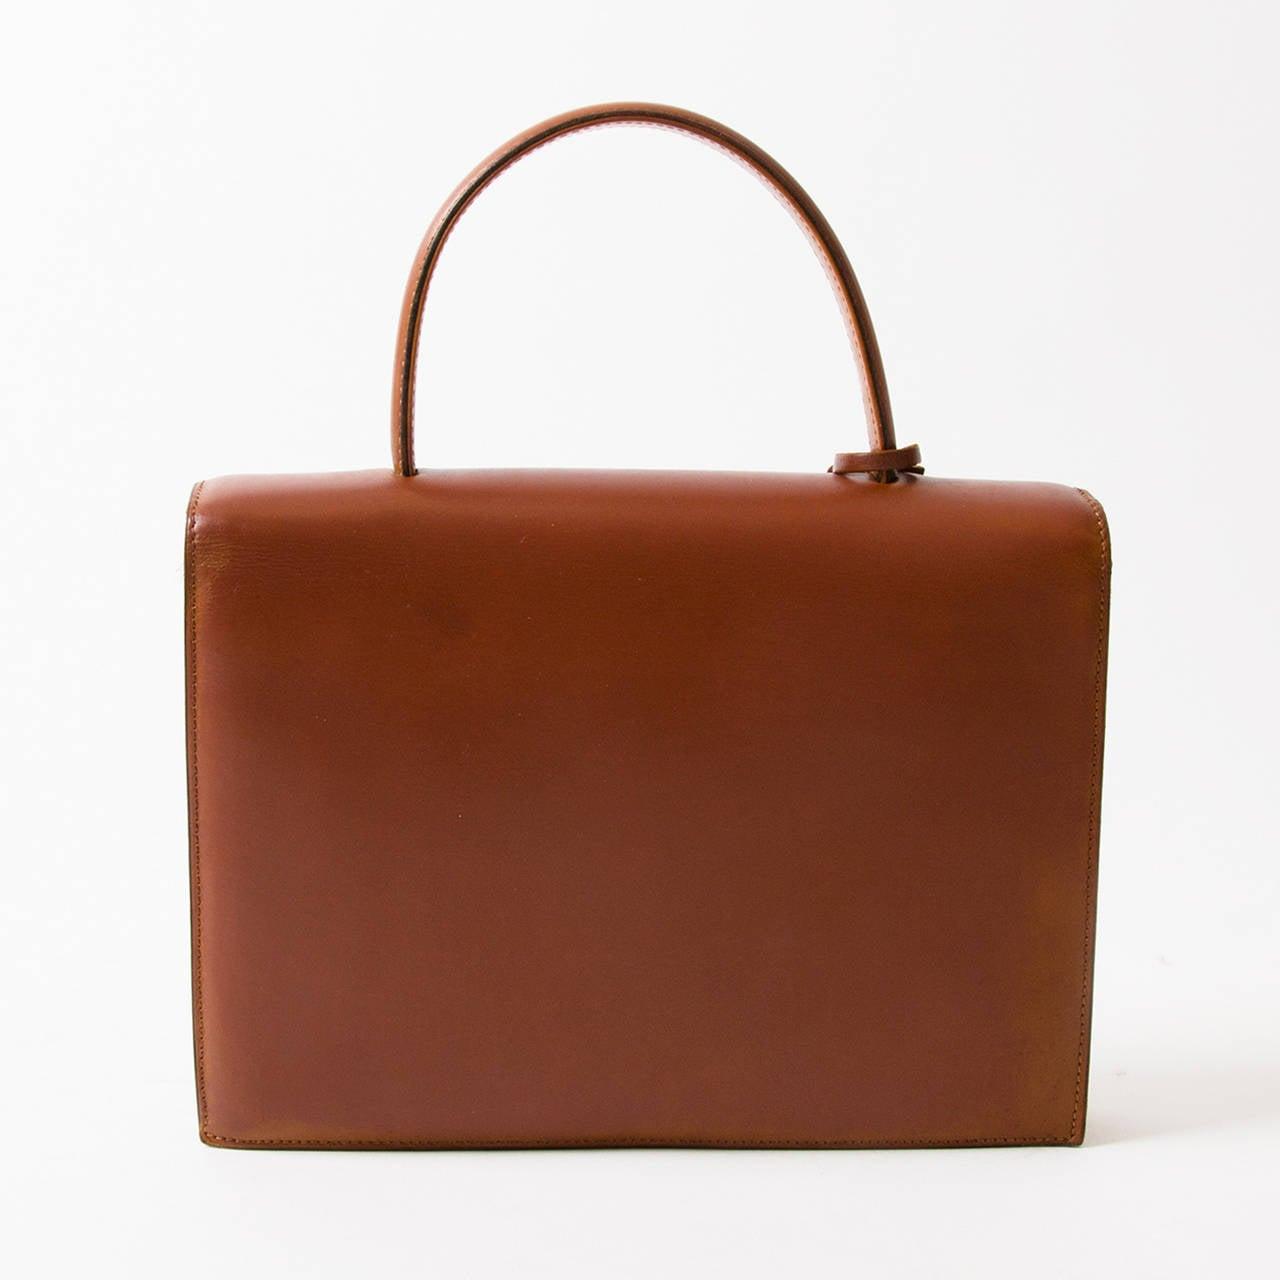 Delvaux Vintage Cognac Top Handle Bag 3